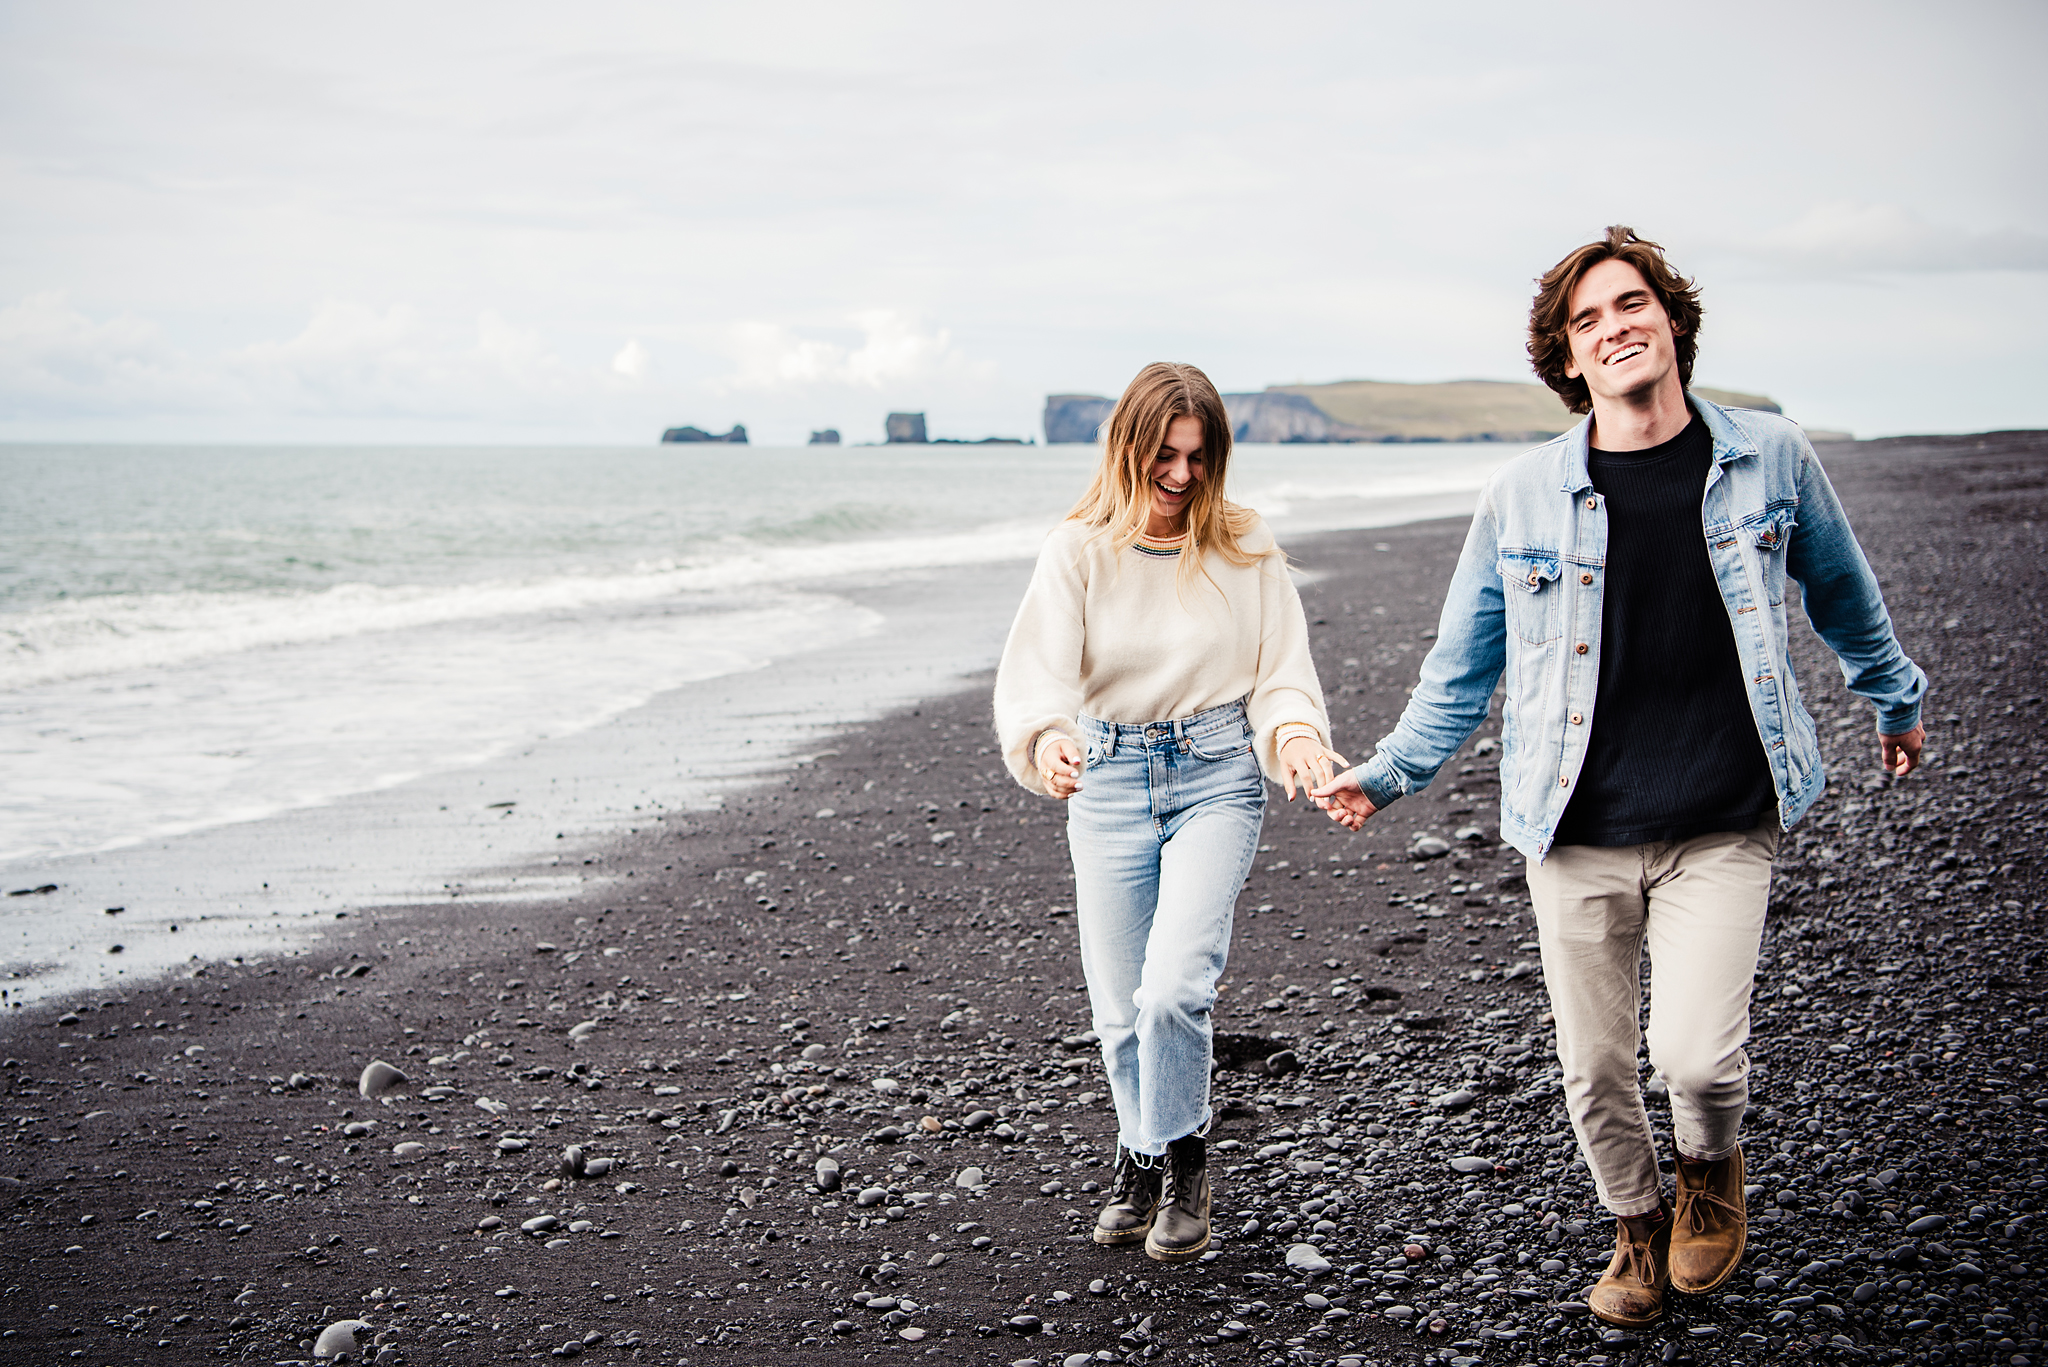 Iceland_Reynisfjara_Black_Sand_Beach_Couples_Session_JILL_STUDIO_Rochester_NY_Photographer_DSC_9693.jpg